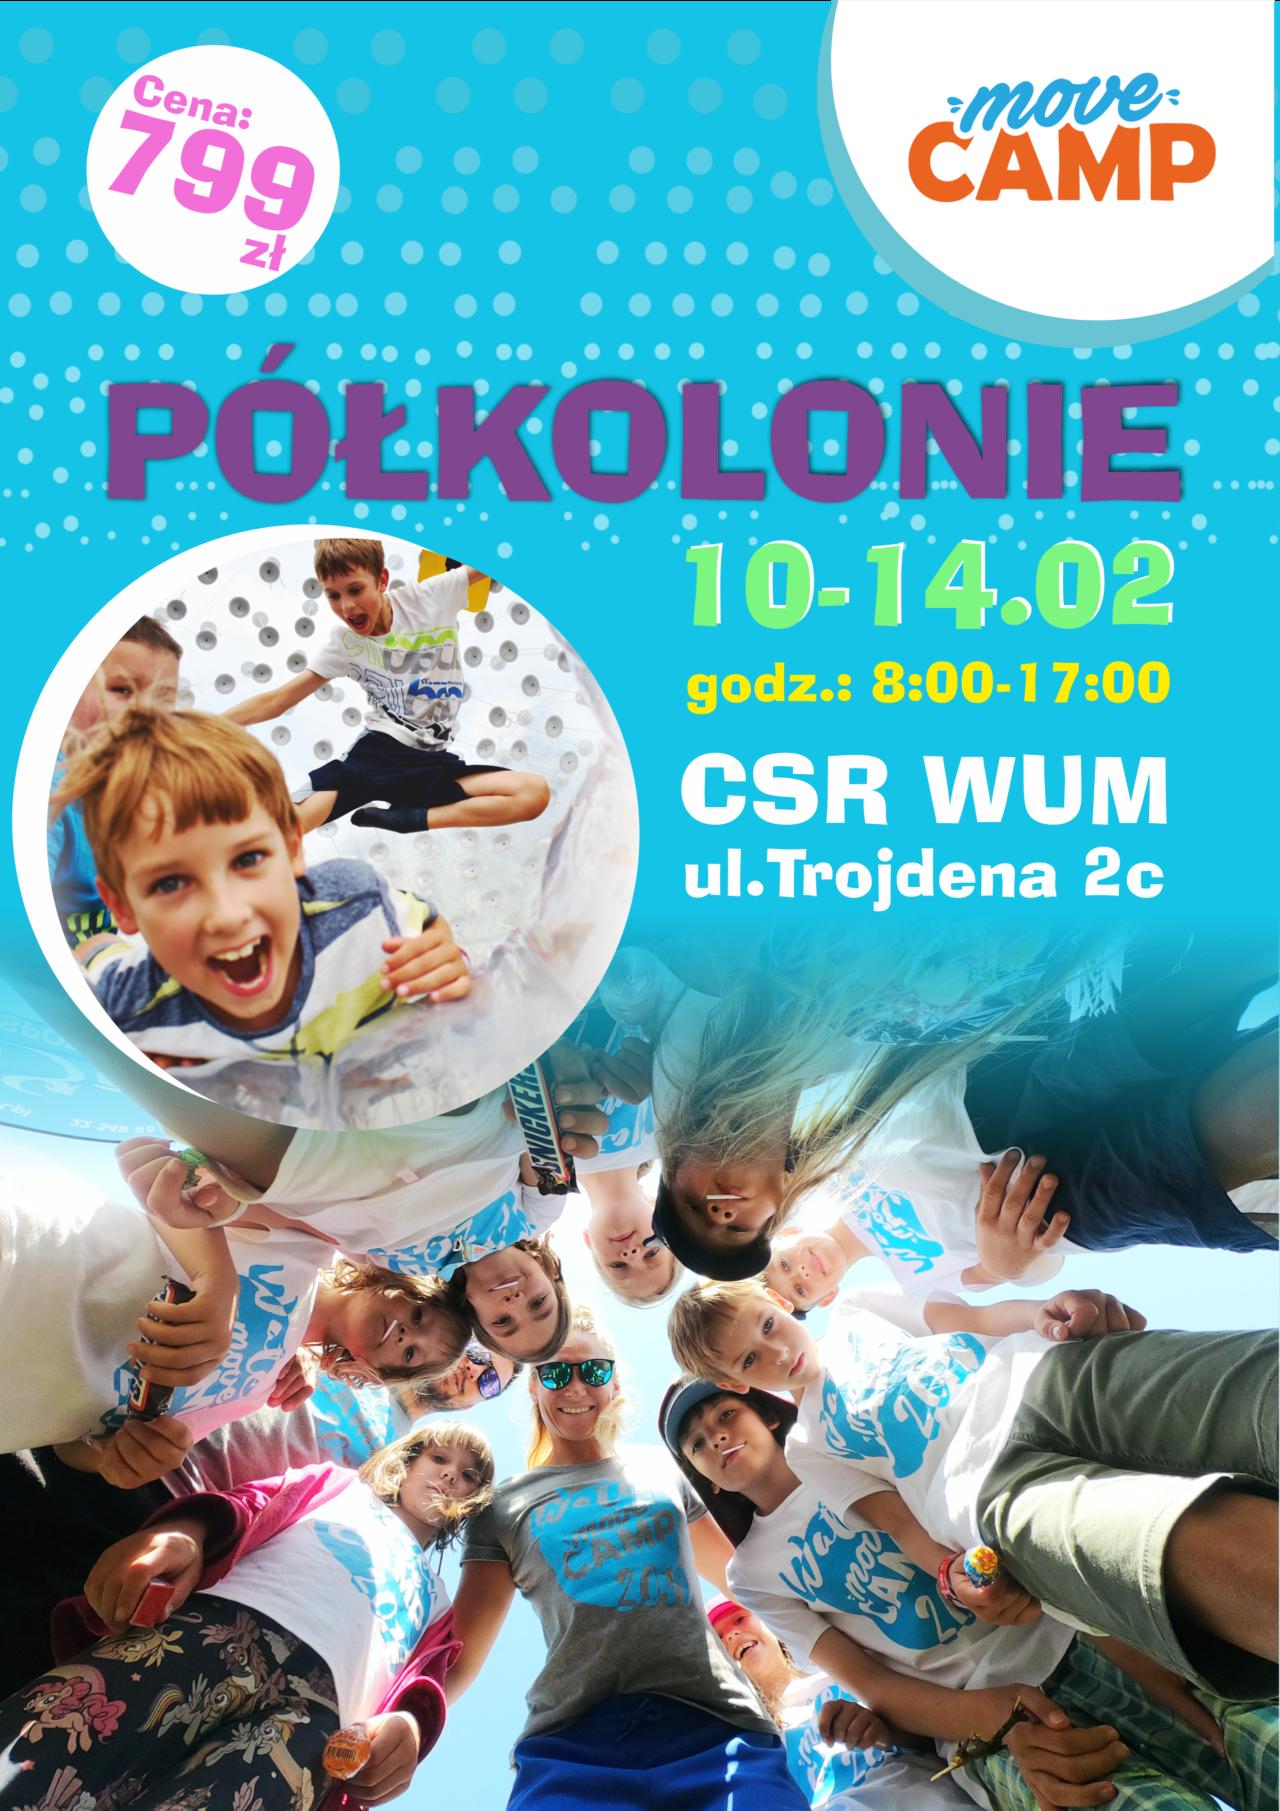 półkolonie-plakat-fb-1-1280x1811.png